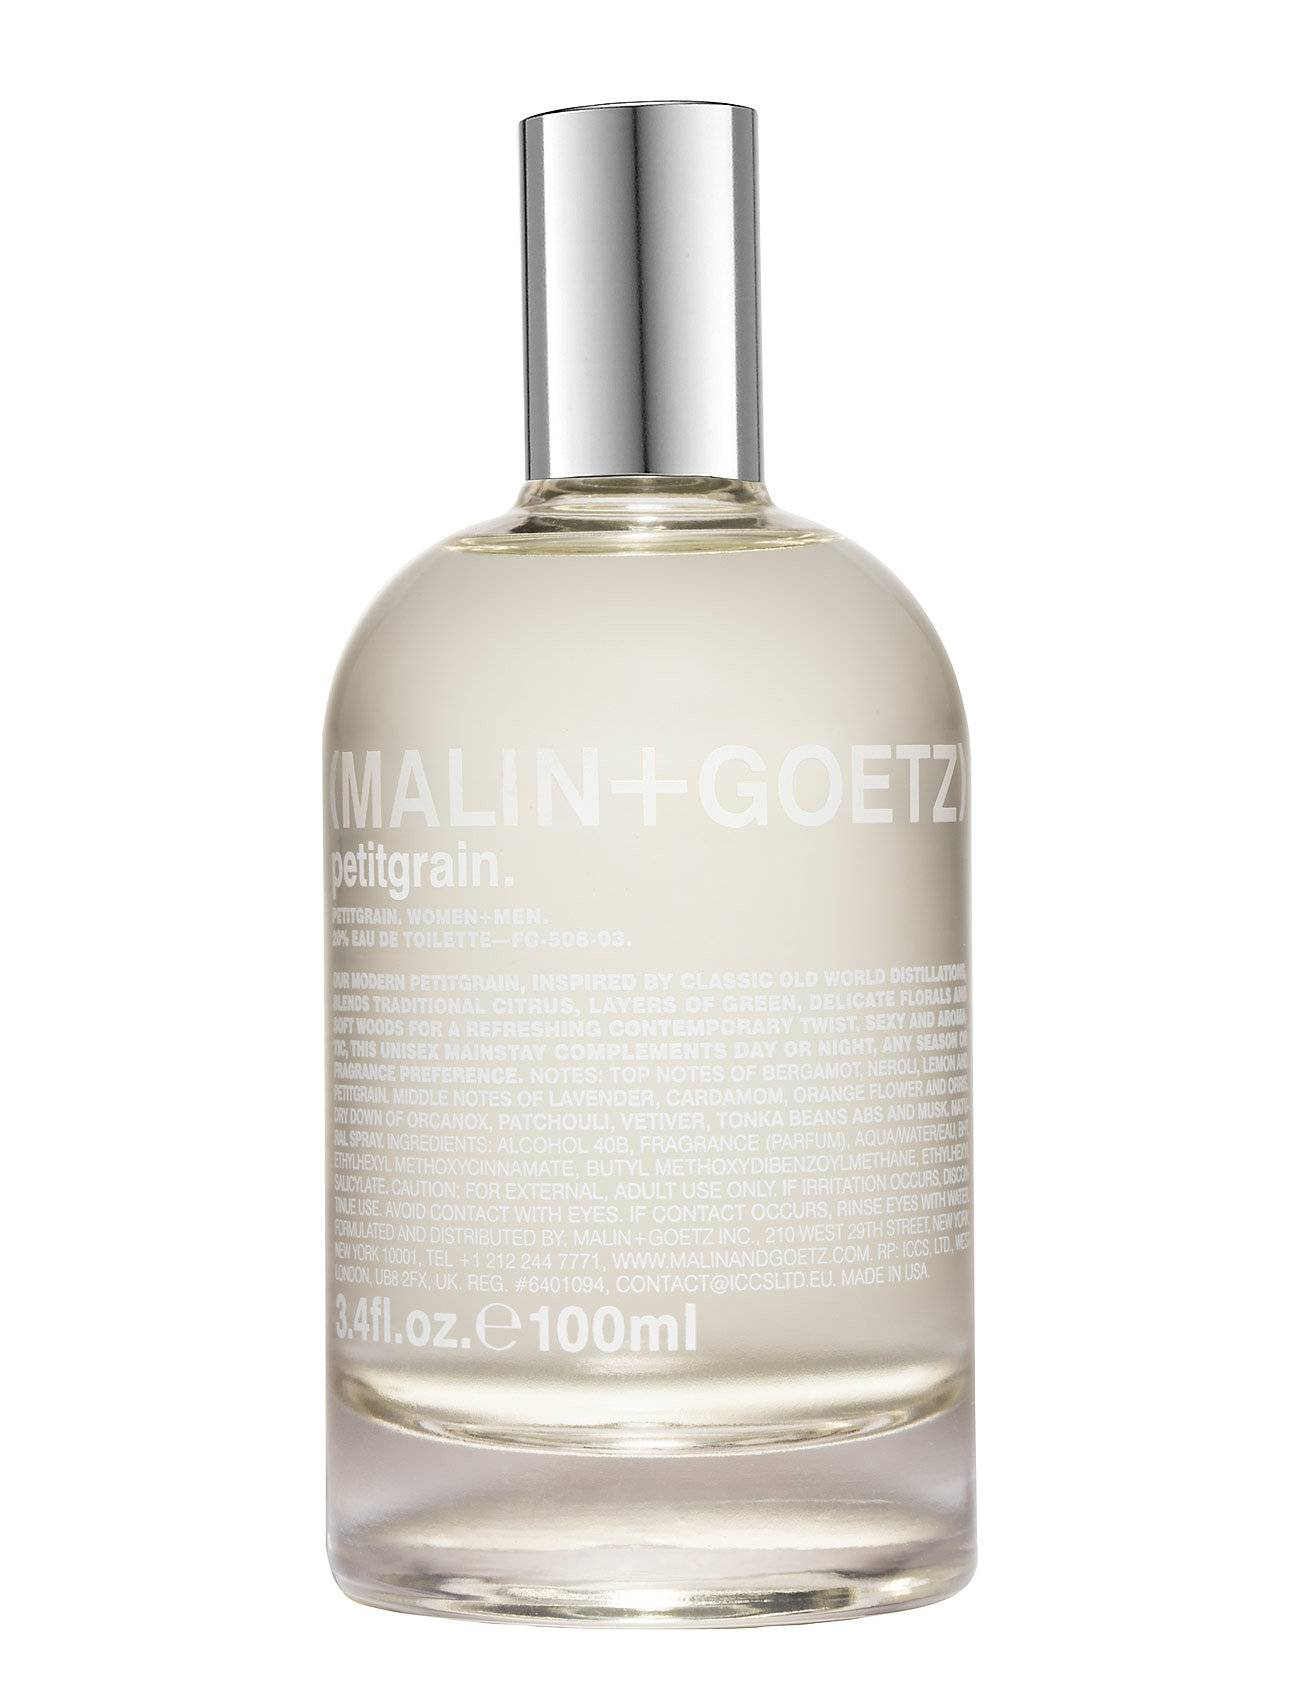 MALIN+GOETZ Petitgrain Eau De Toilette Hajuvesi Eau De Parfum Nude MALIN+GOETZ